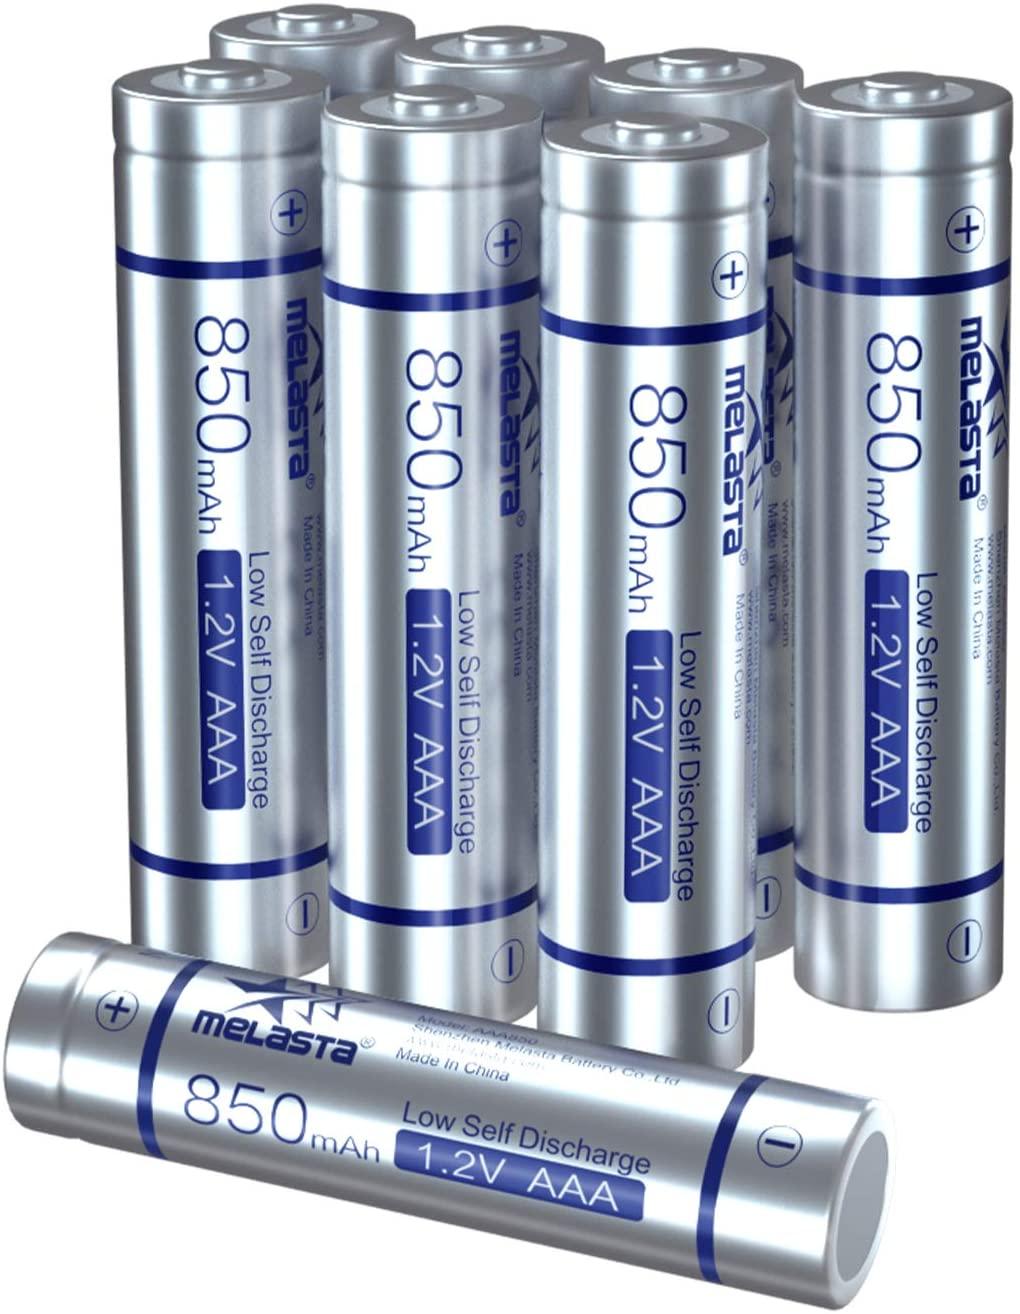 MELASTA AAA Rechargeable Batteries, 850mAh 8-Pack 1.2V NiMH 1200 Cycle